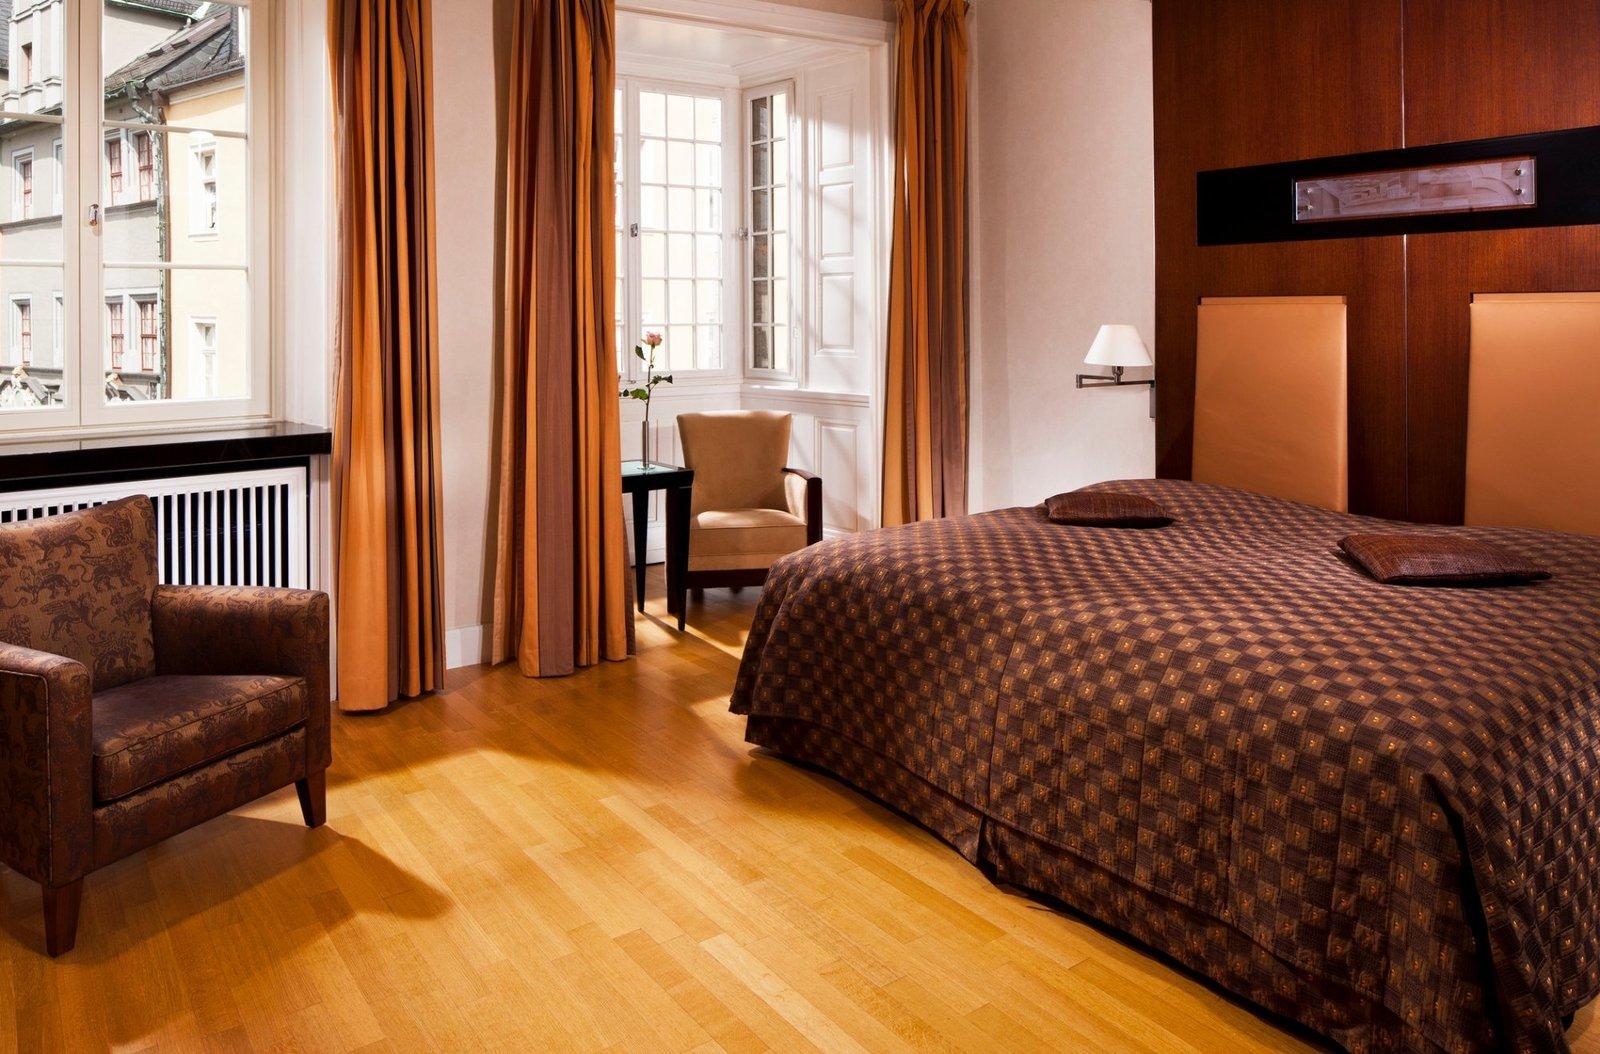 Bedroom, Wall Lighting, Chair, Bed, and Medium Hardwood Floor  Hotel Elephant